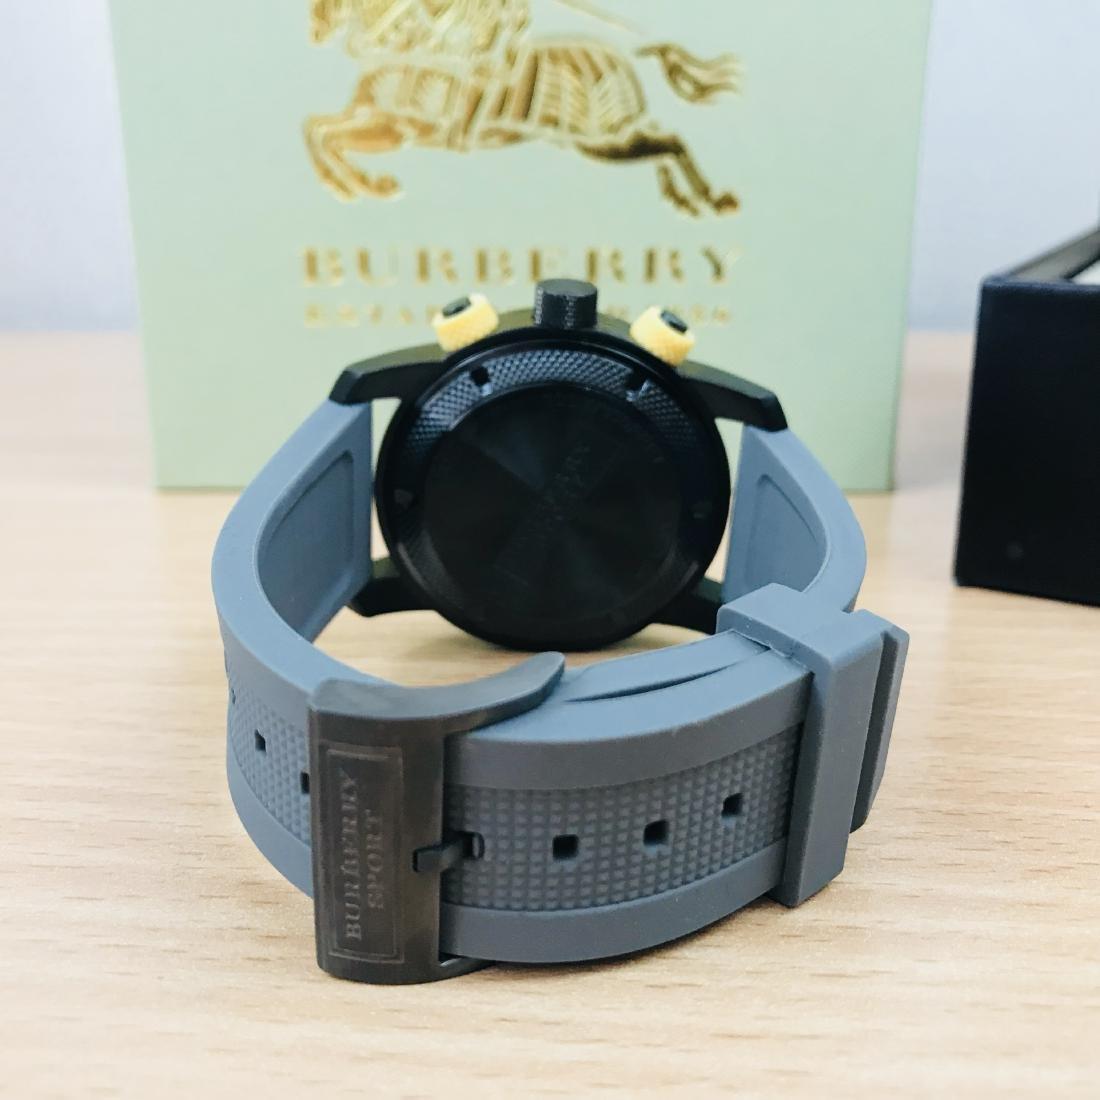 Burberry Endurance Swiss Made Men's Chronograph Watch - 6